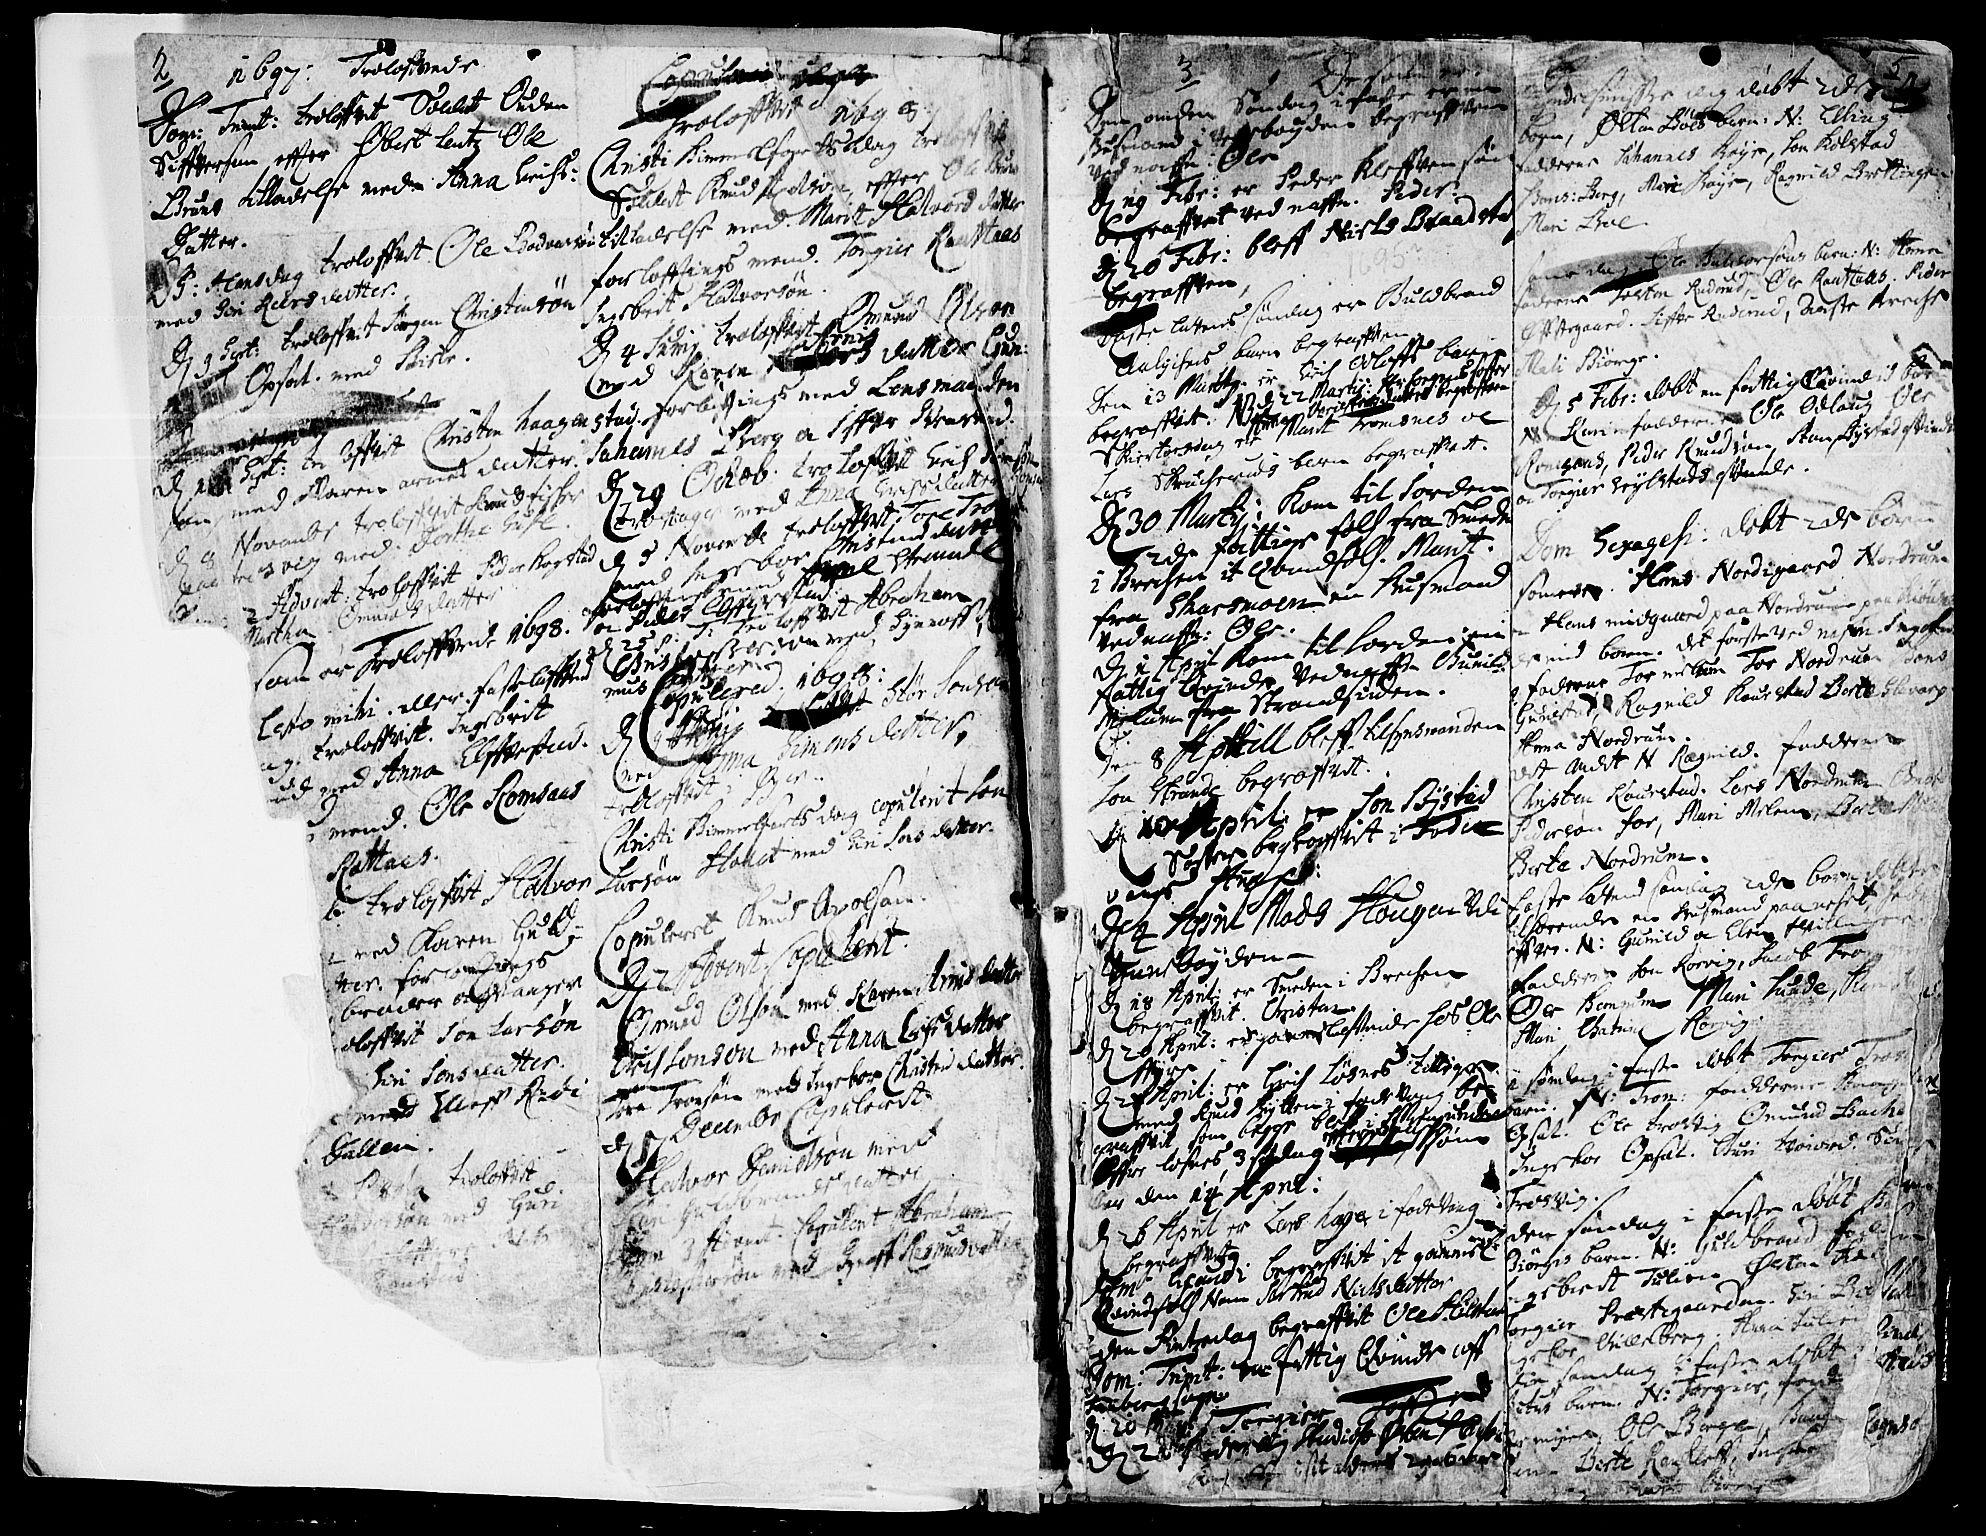 SAH, Ringebu prestekontor, Ministerialbok nr. 1, 1696-1733, s. 2-5